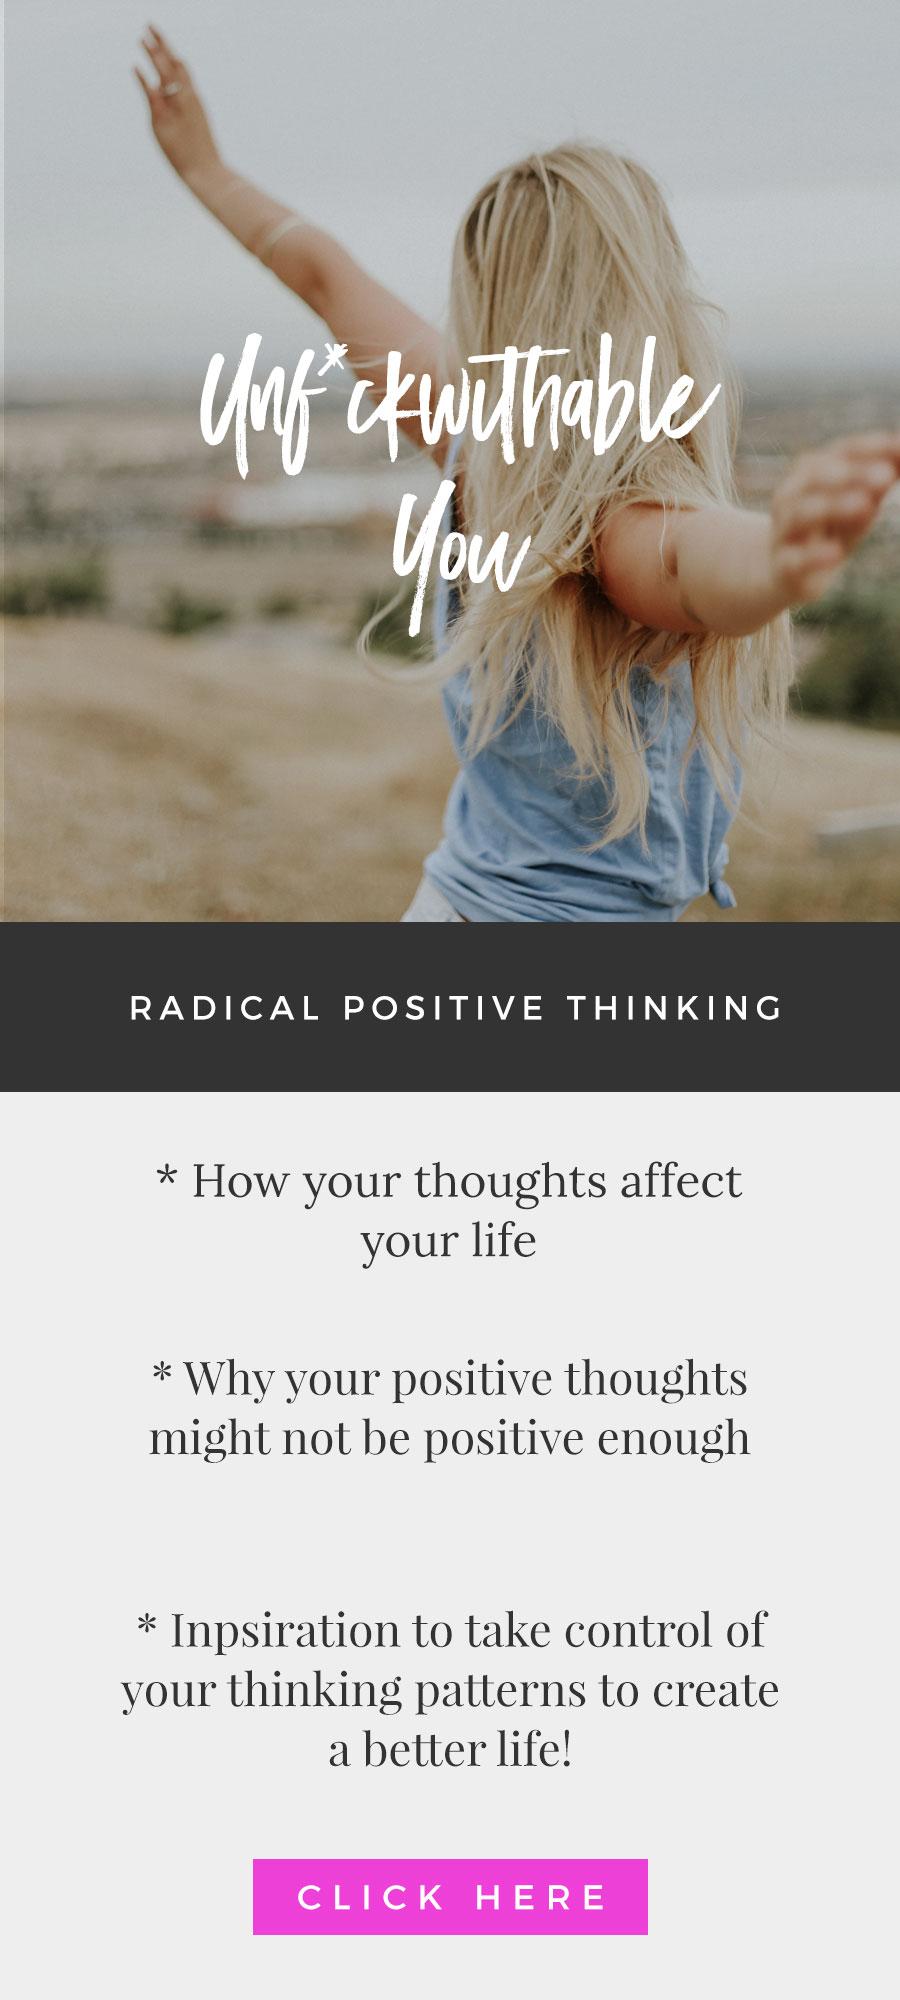 Unf*ckwithable You Episode 63: Radical Positive Thinking